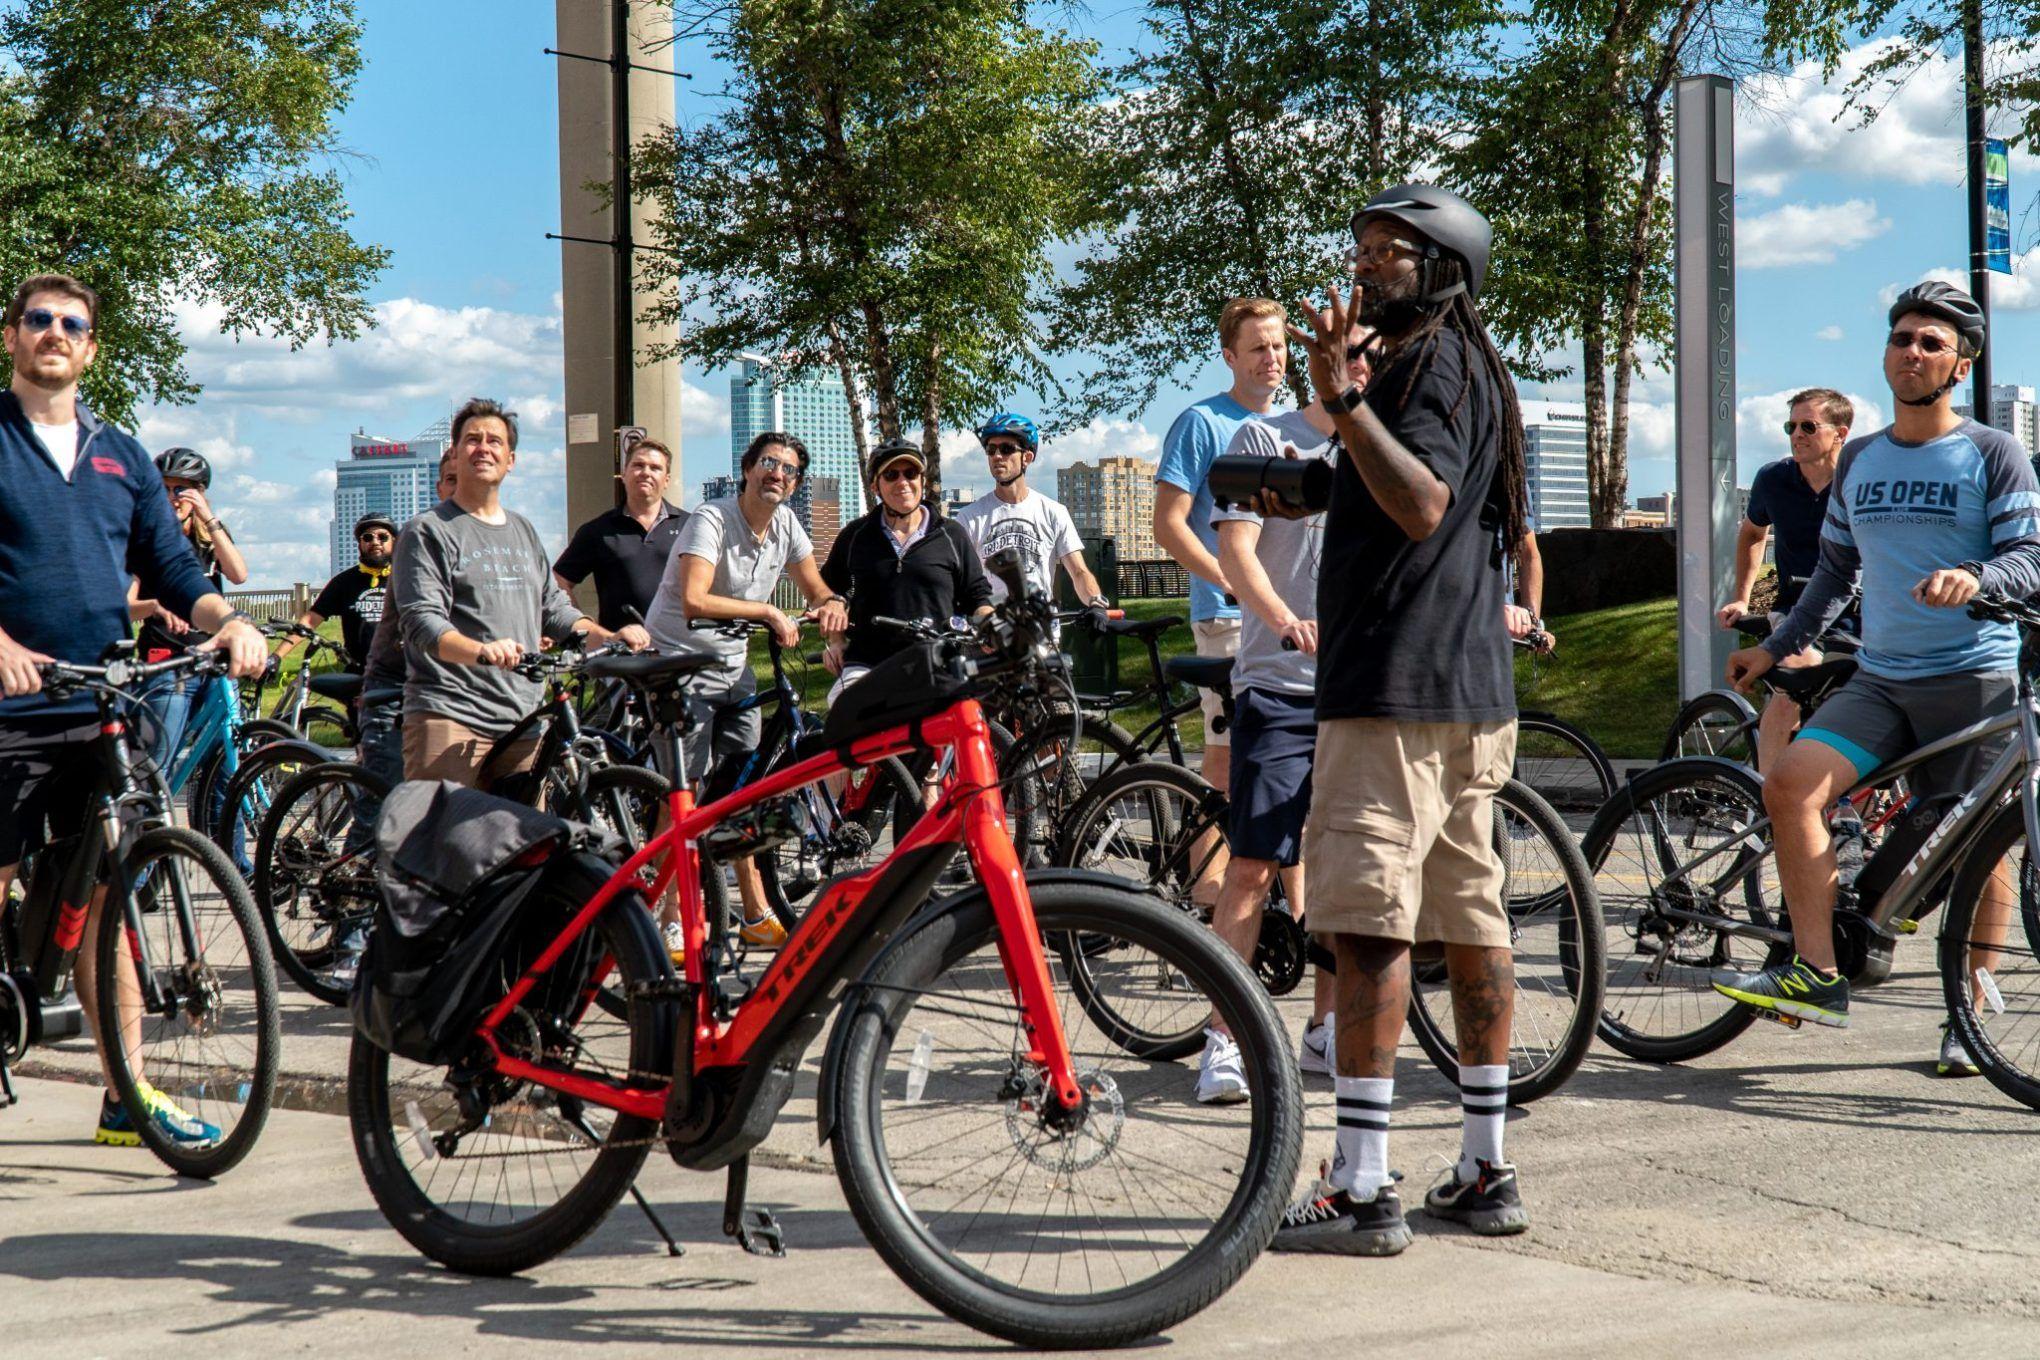 E Bikes Make Exploring The City Even More Exciting Ebike